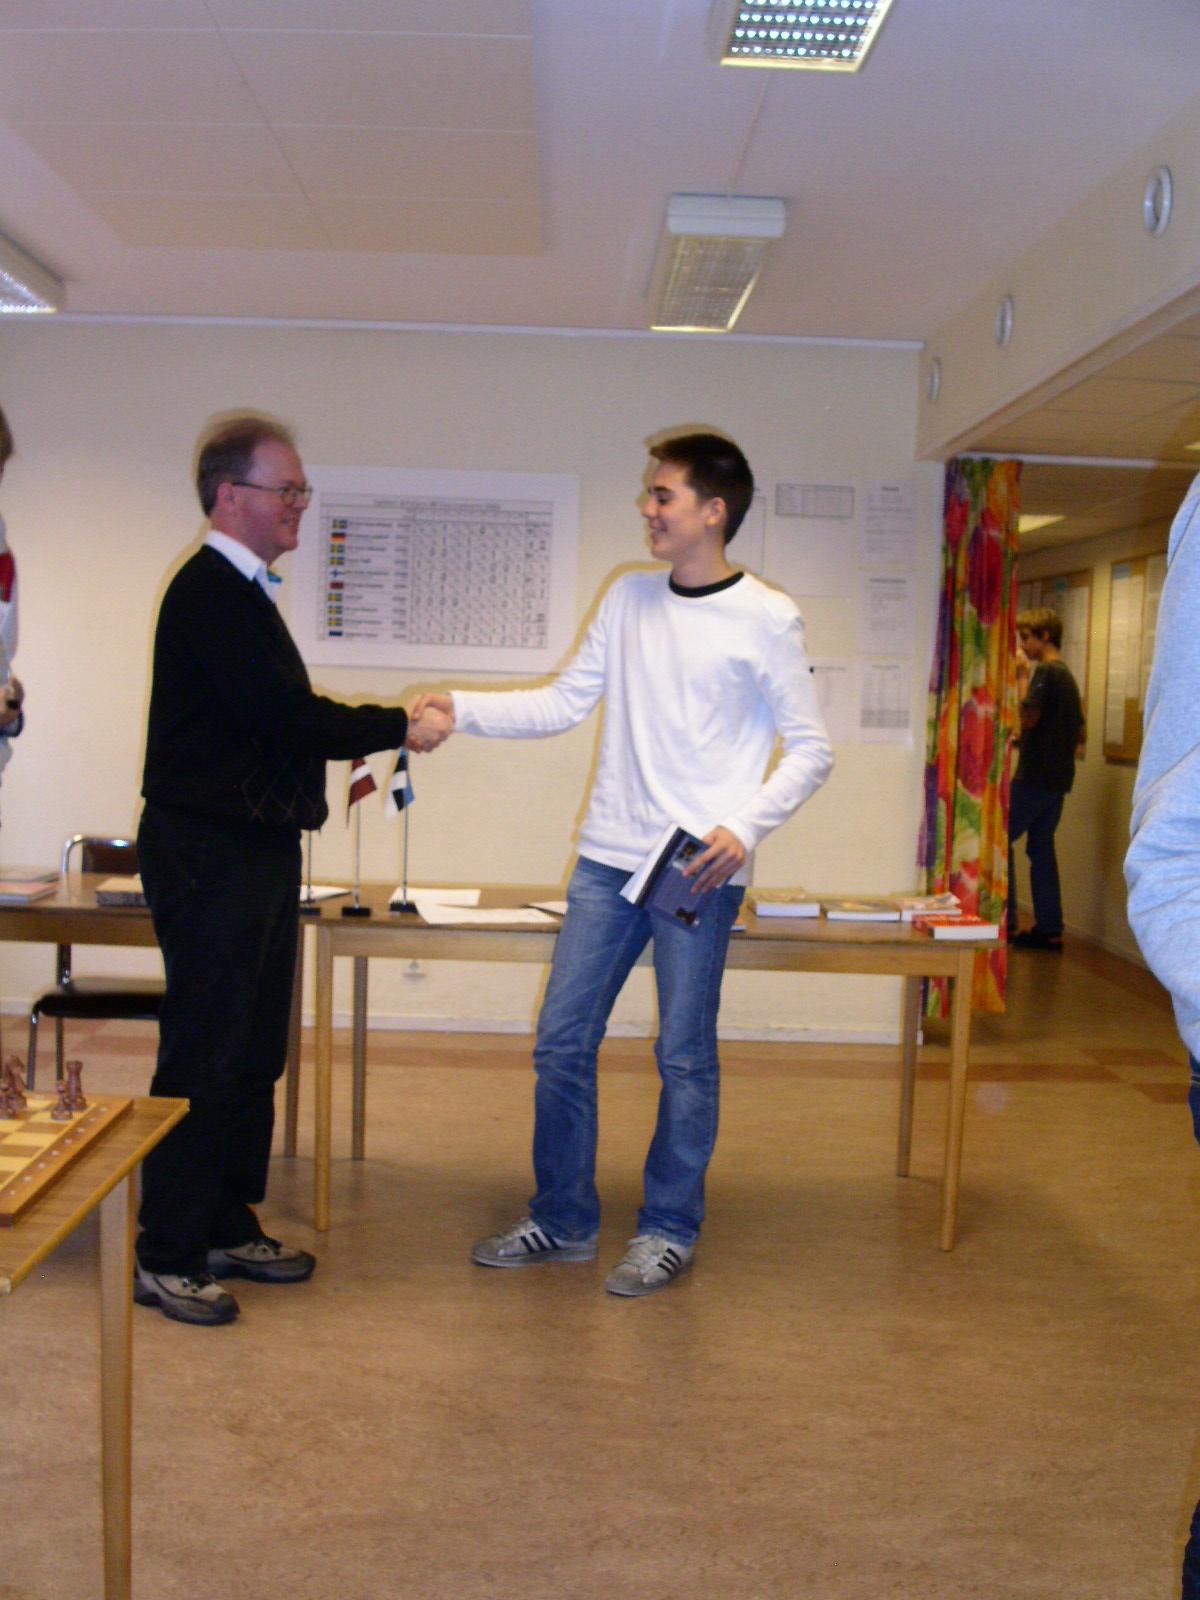 Mats Eriksson gratulerar bäste manhemiten Johannes Aira till sjättepriset